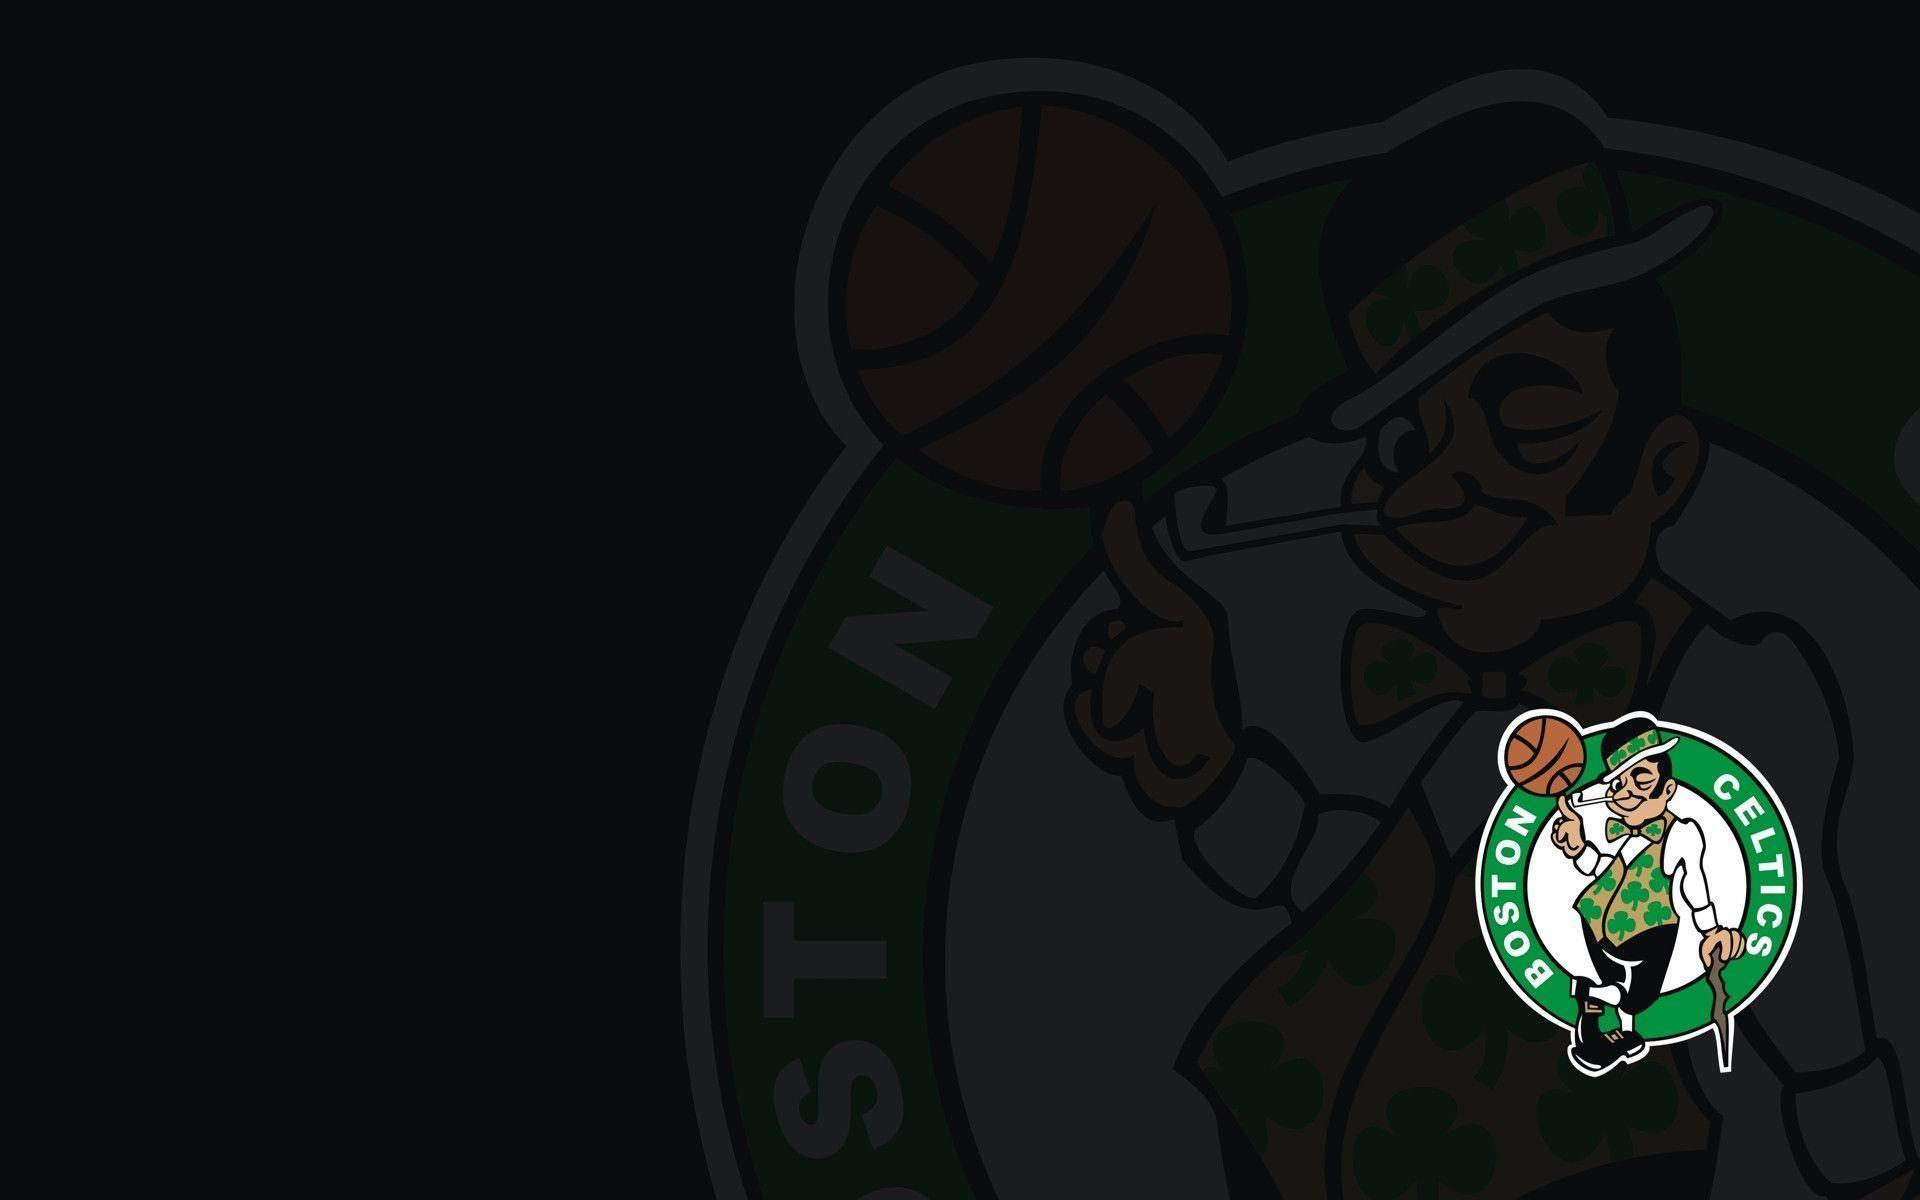 Boston Celtics Wallpapers - Full HD wallpaper search